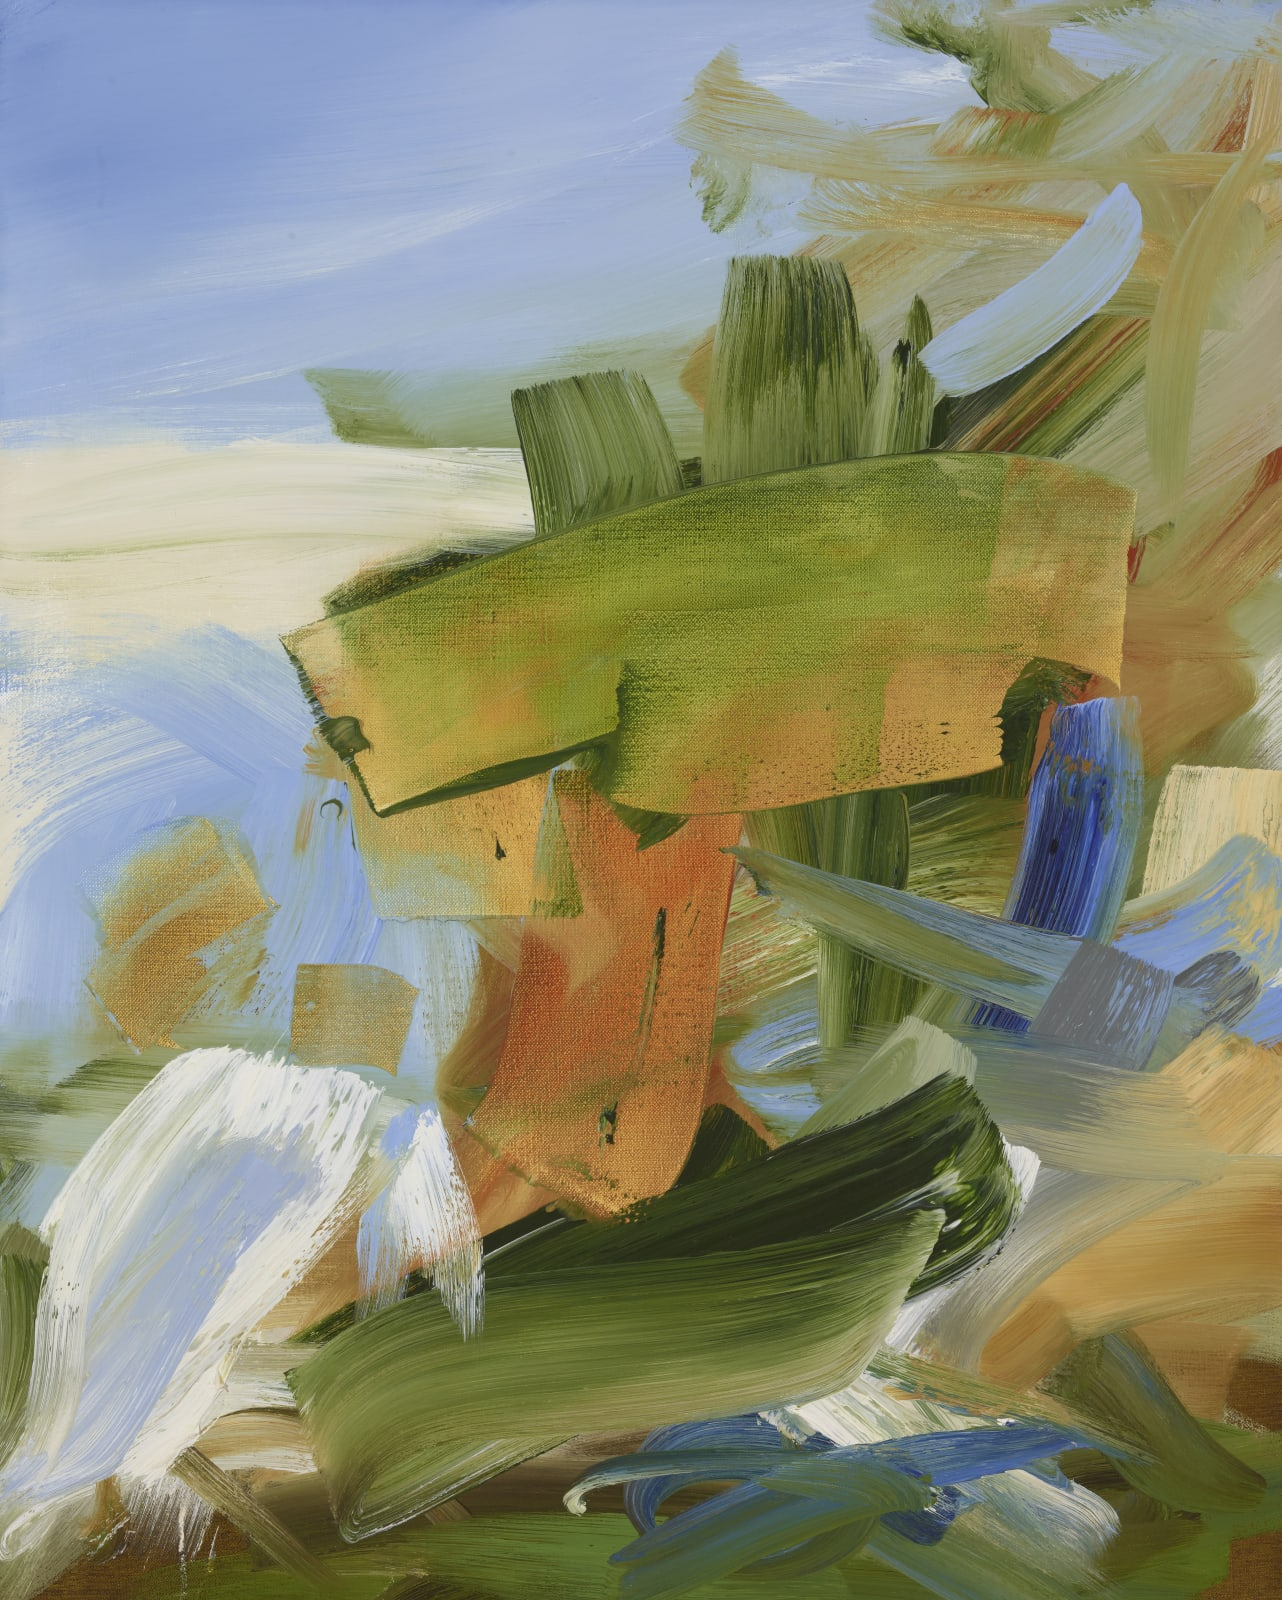 Medium Study for Generosity oil on canvas 76cm x 61cm (30